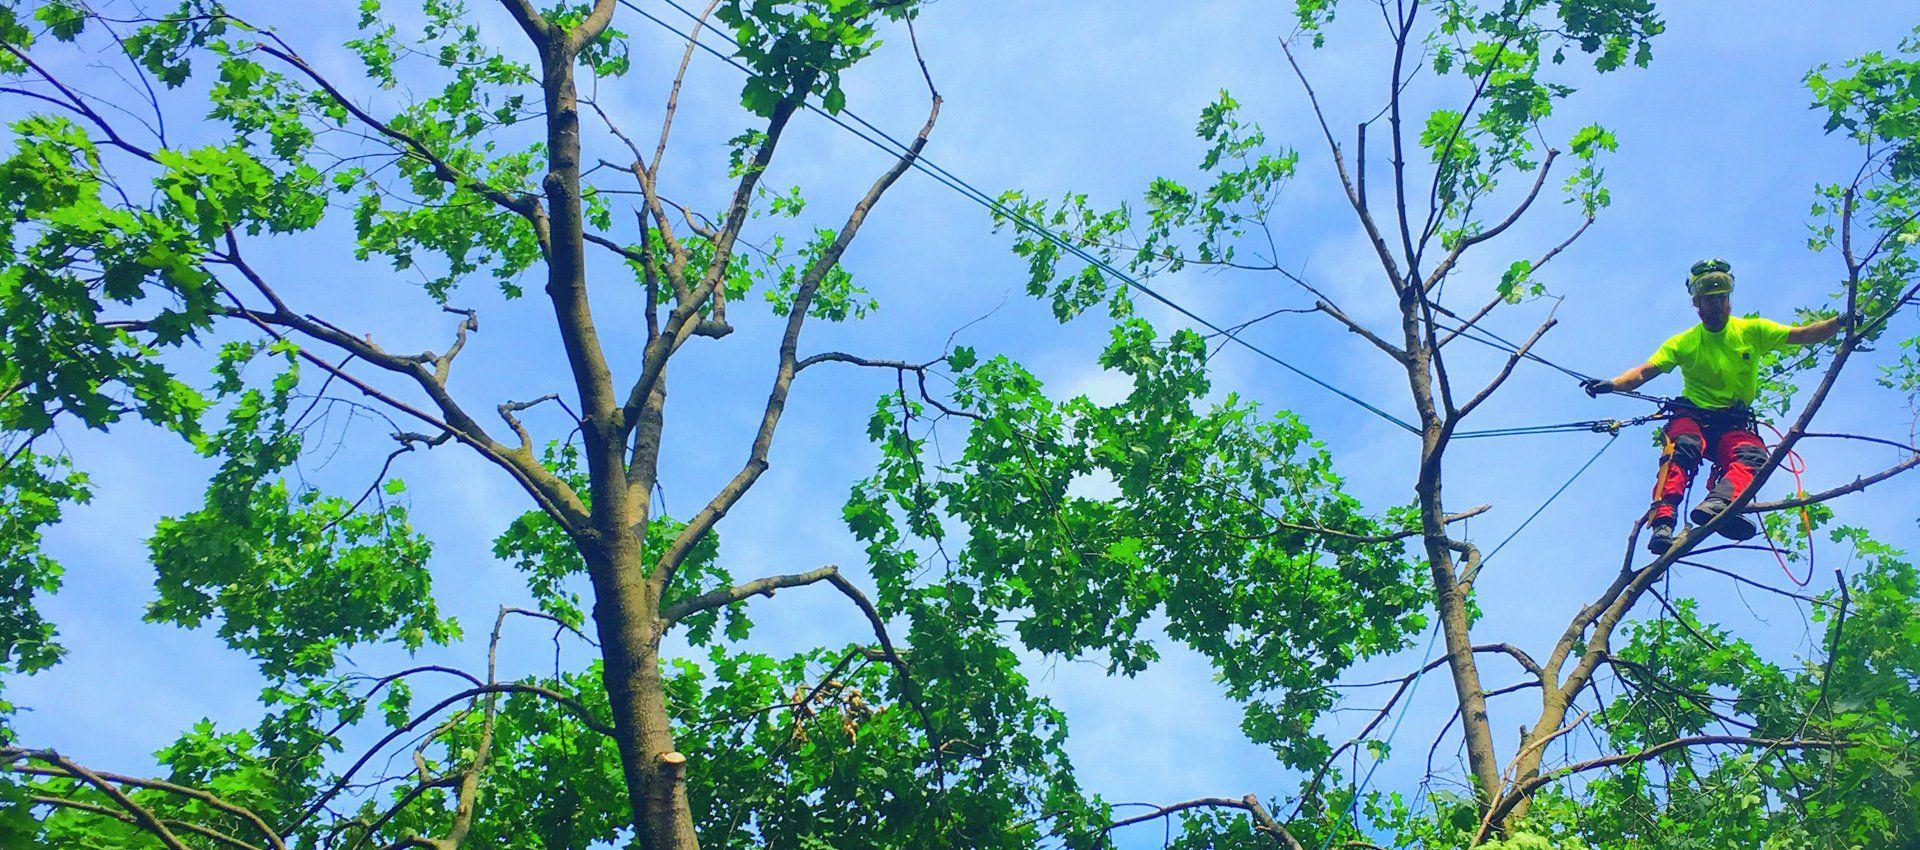 Aurora Tree Service | Certified Arborists Aurora, Ontario